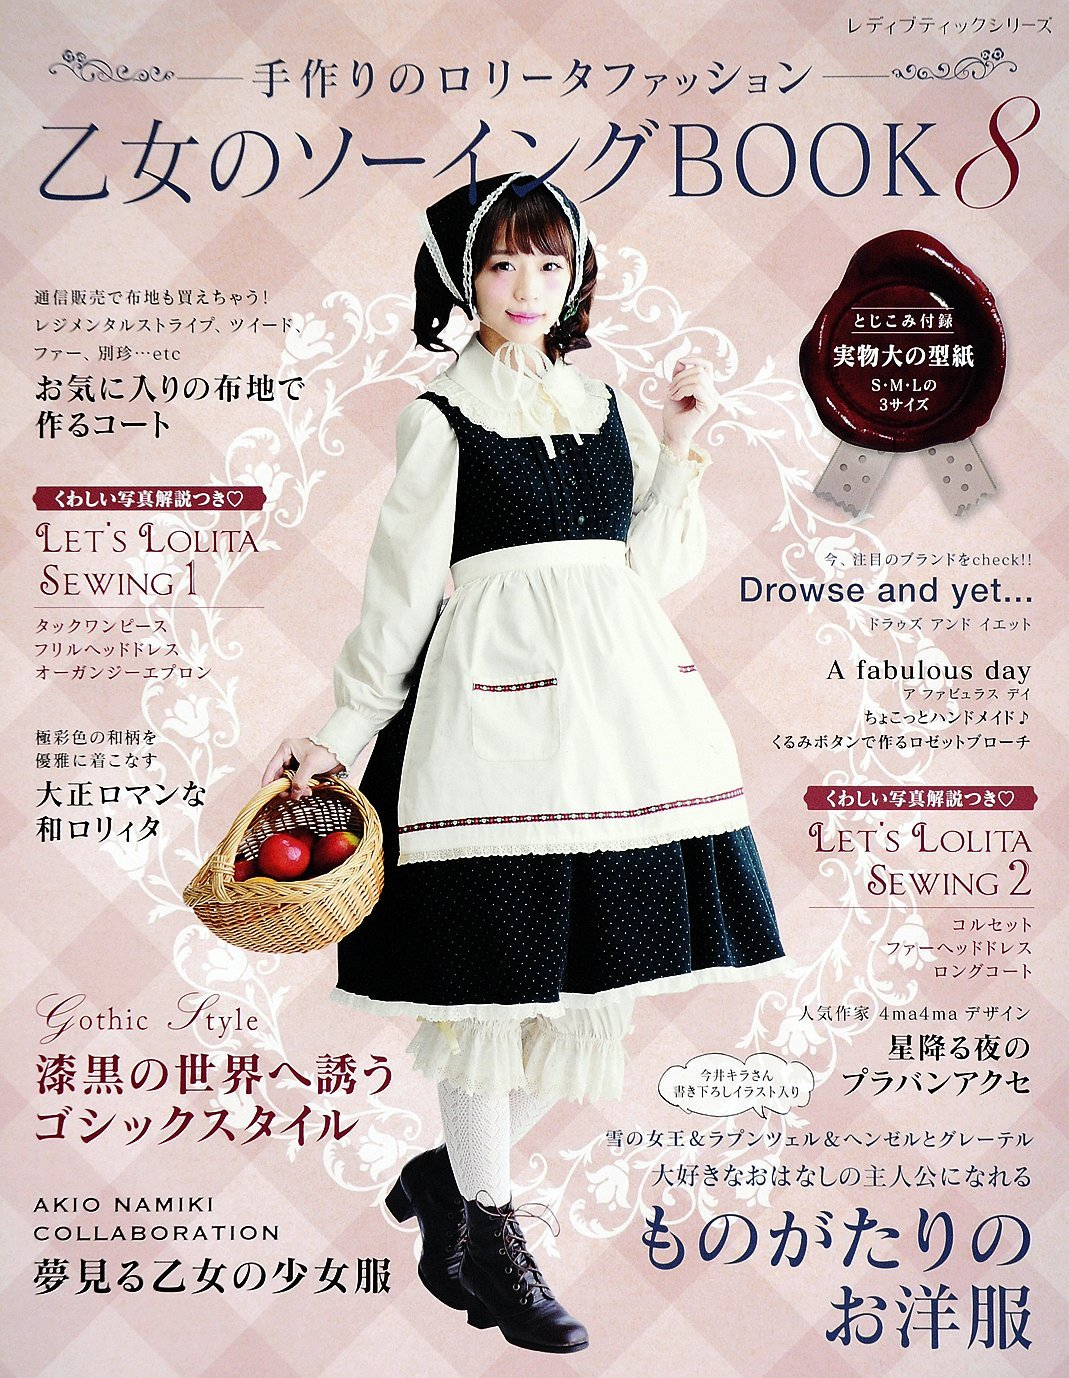 Lolita Fashion sawing BOOK 8